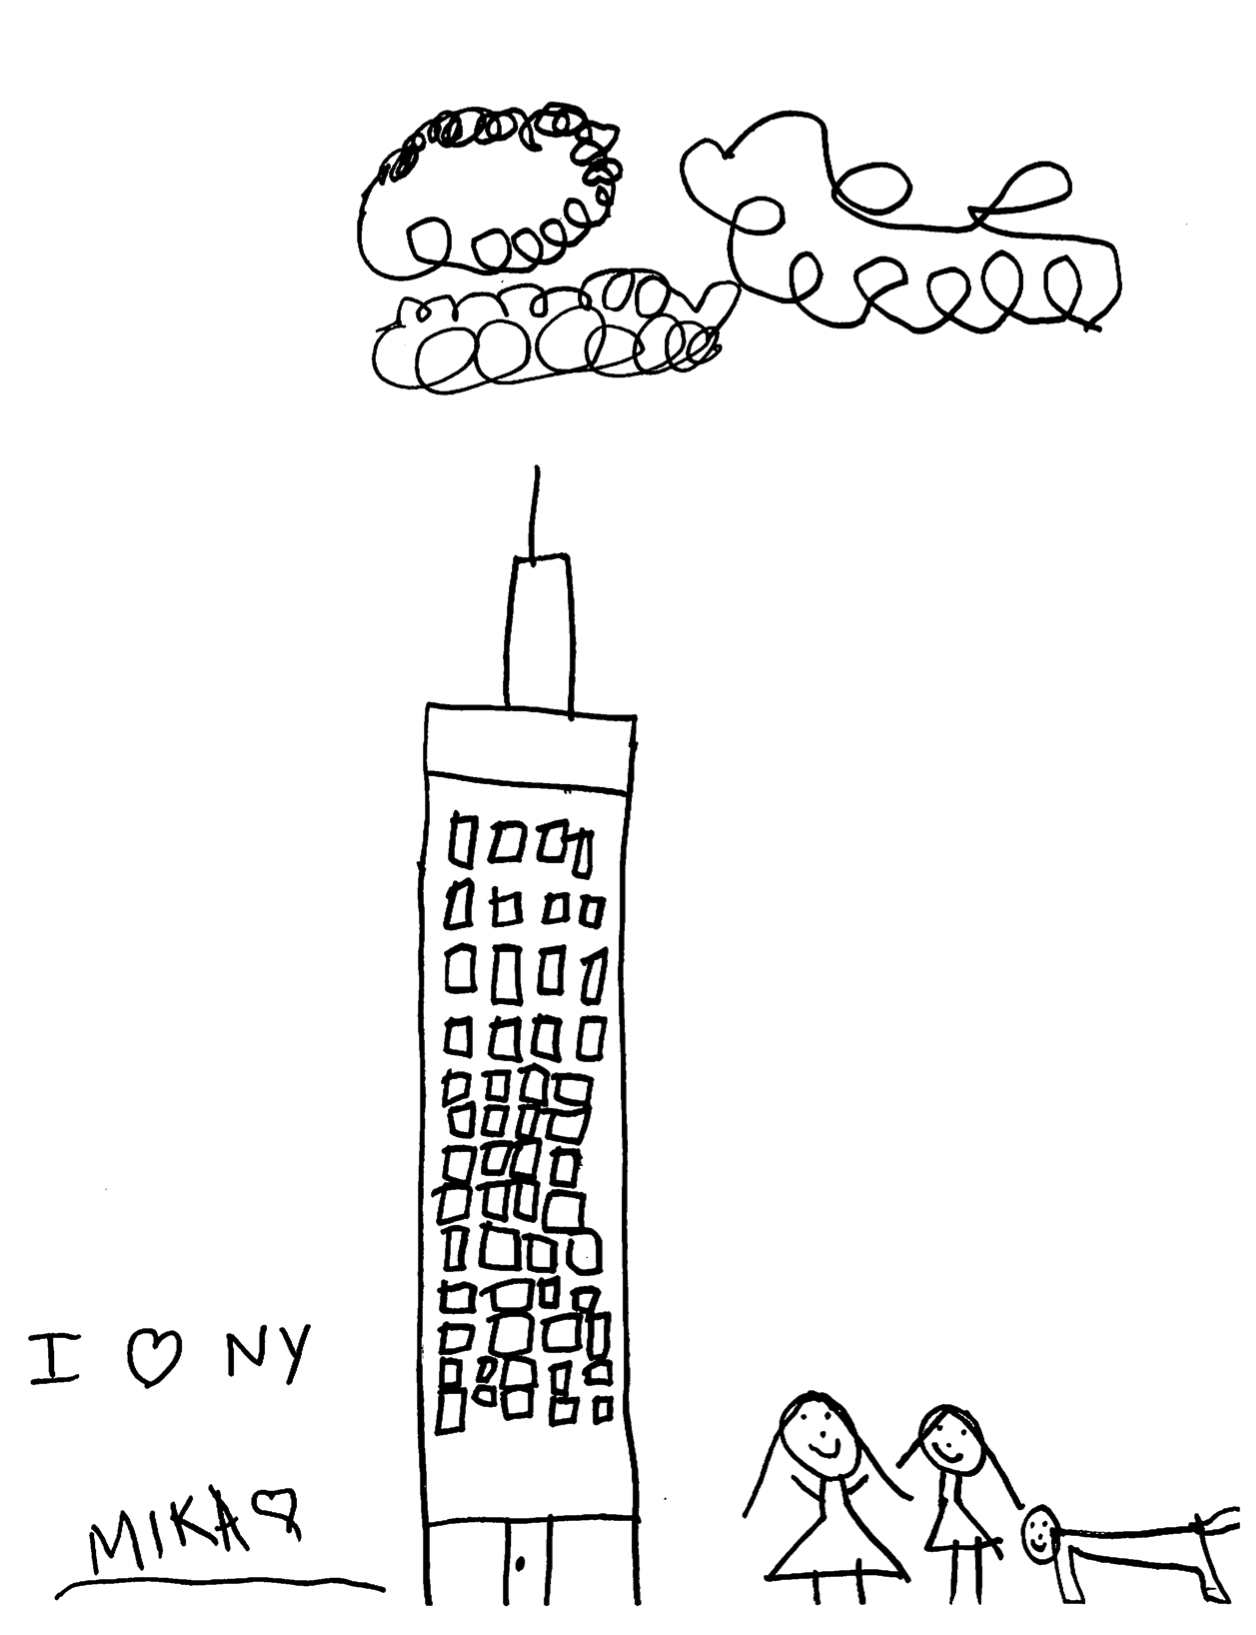 Mika Drawing.jpg